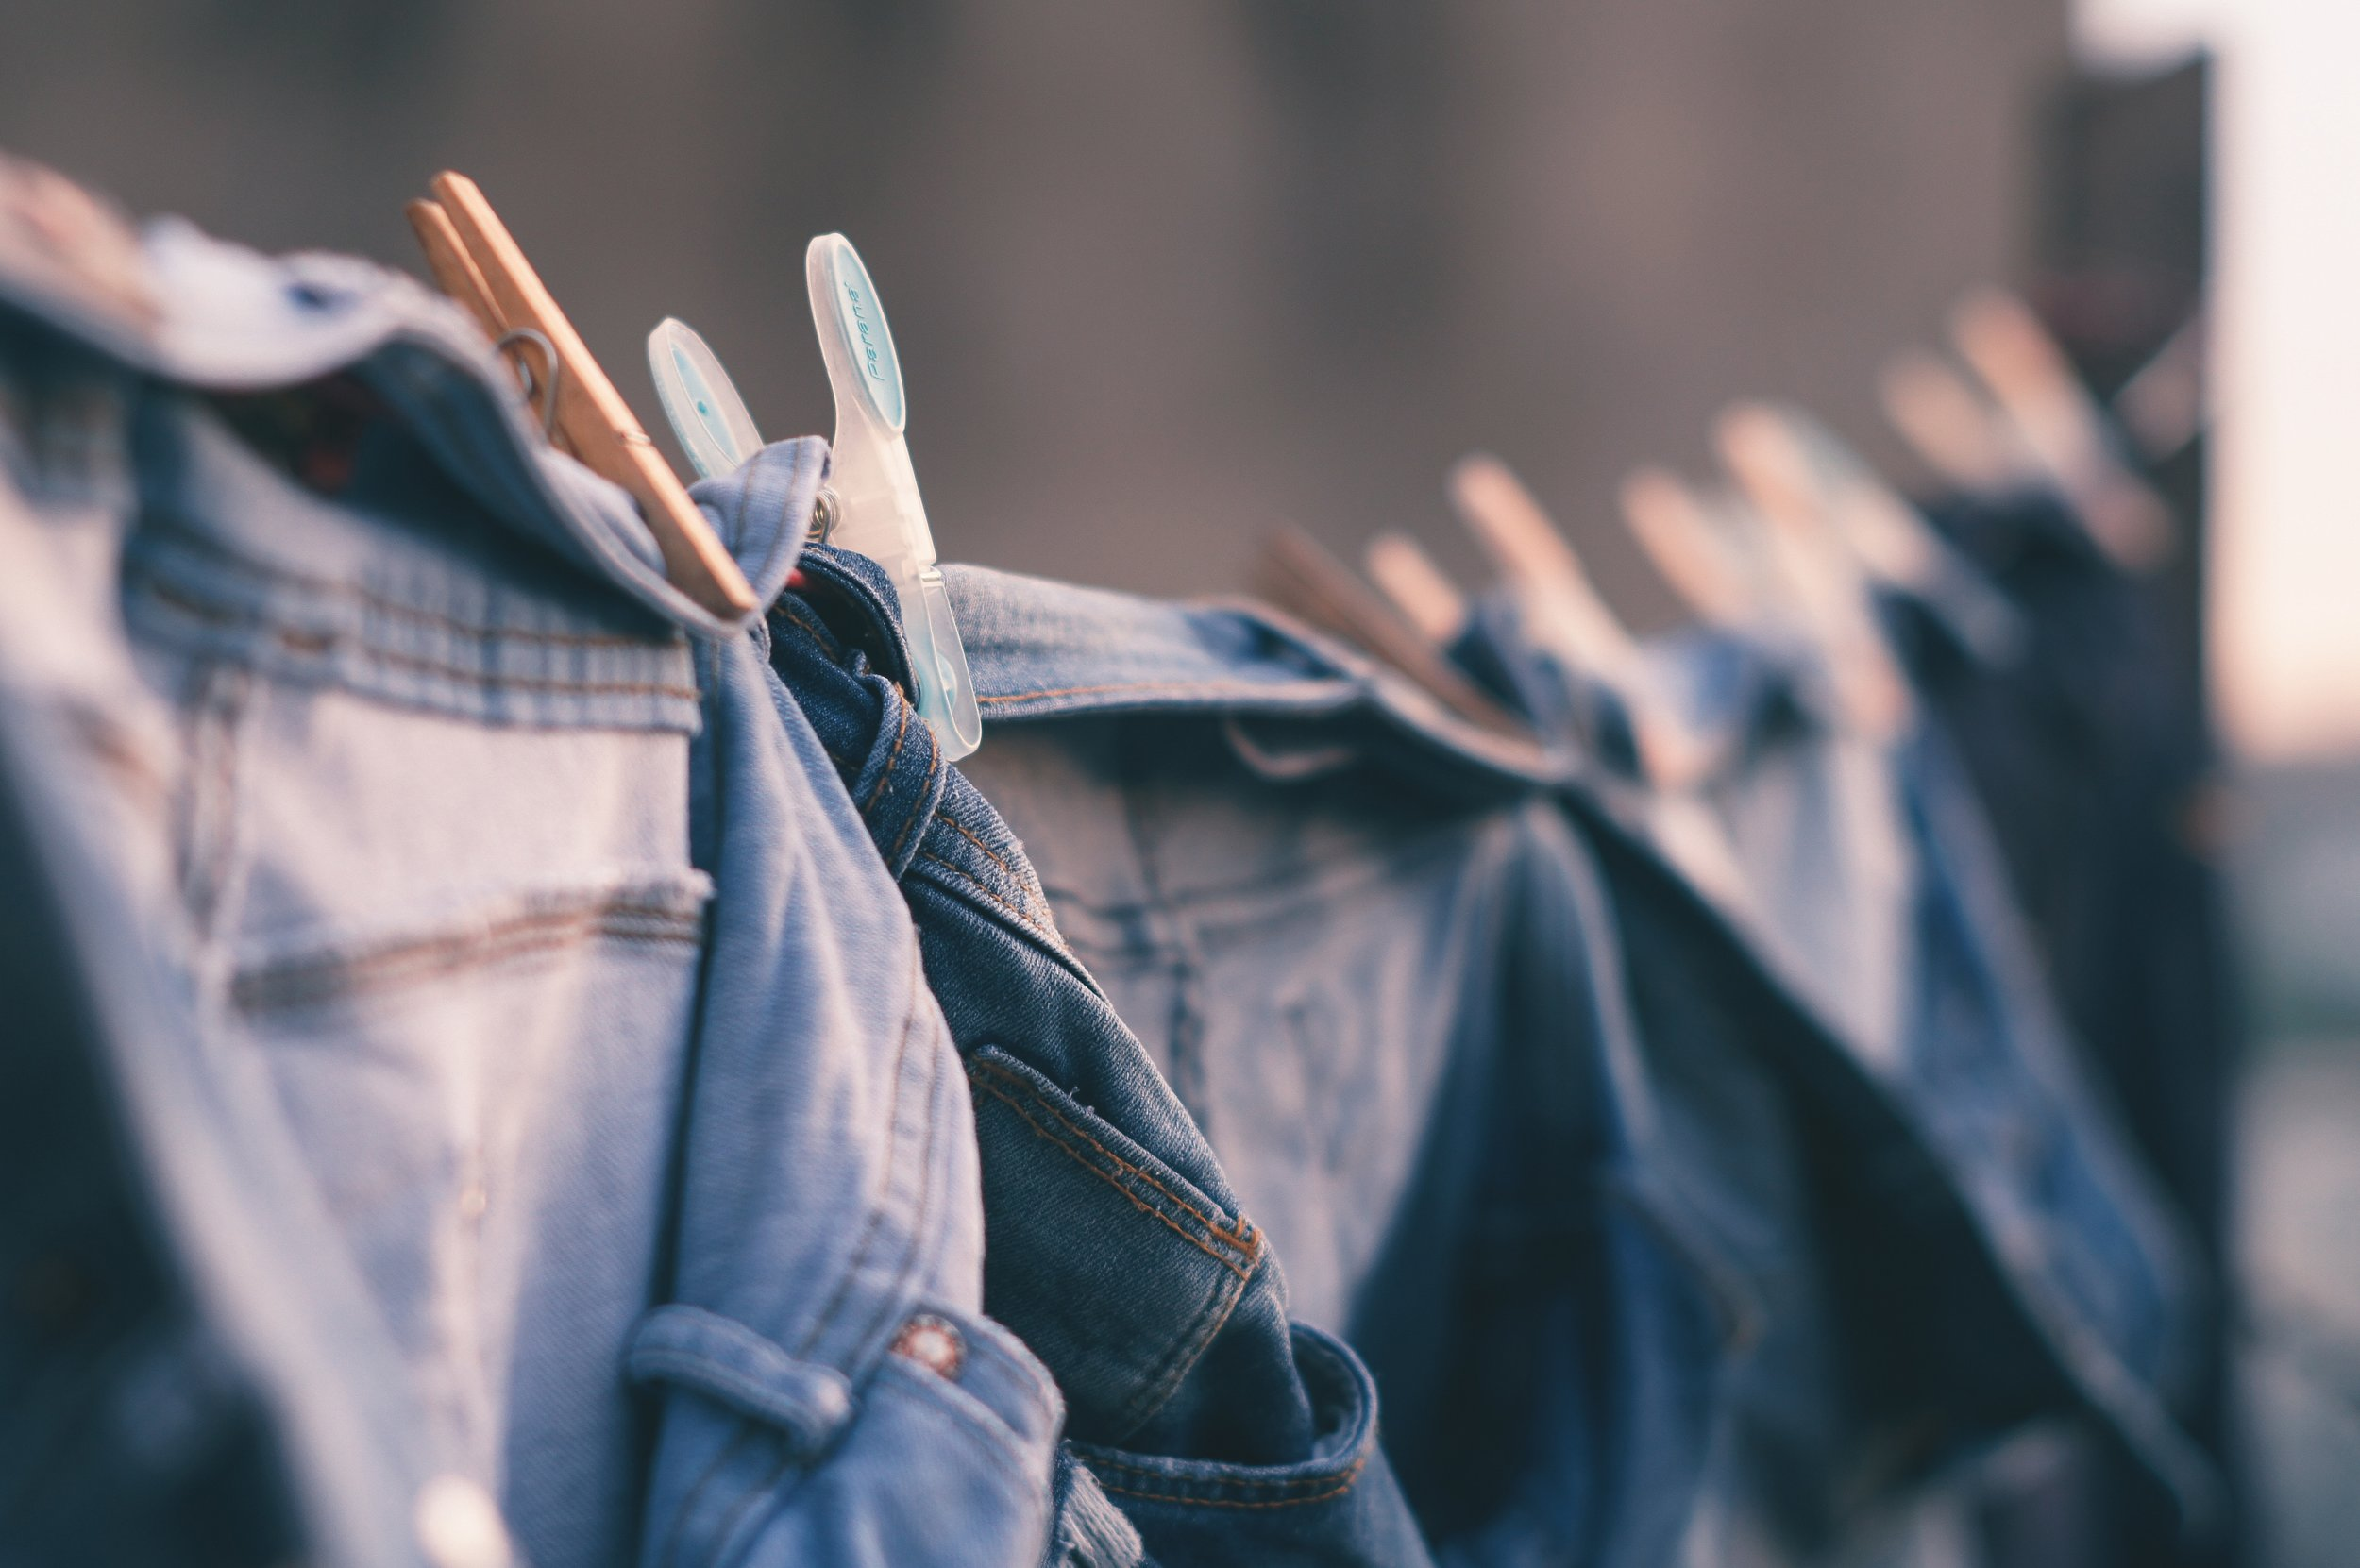 Jean clothes